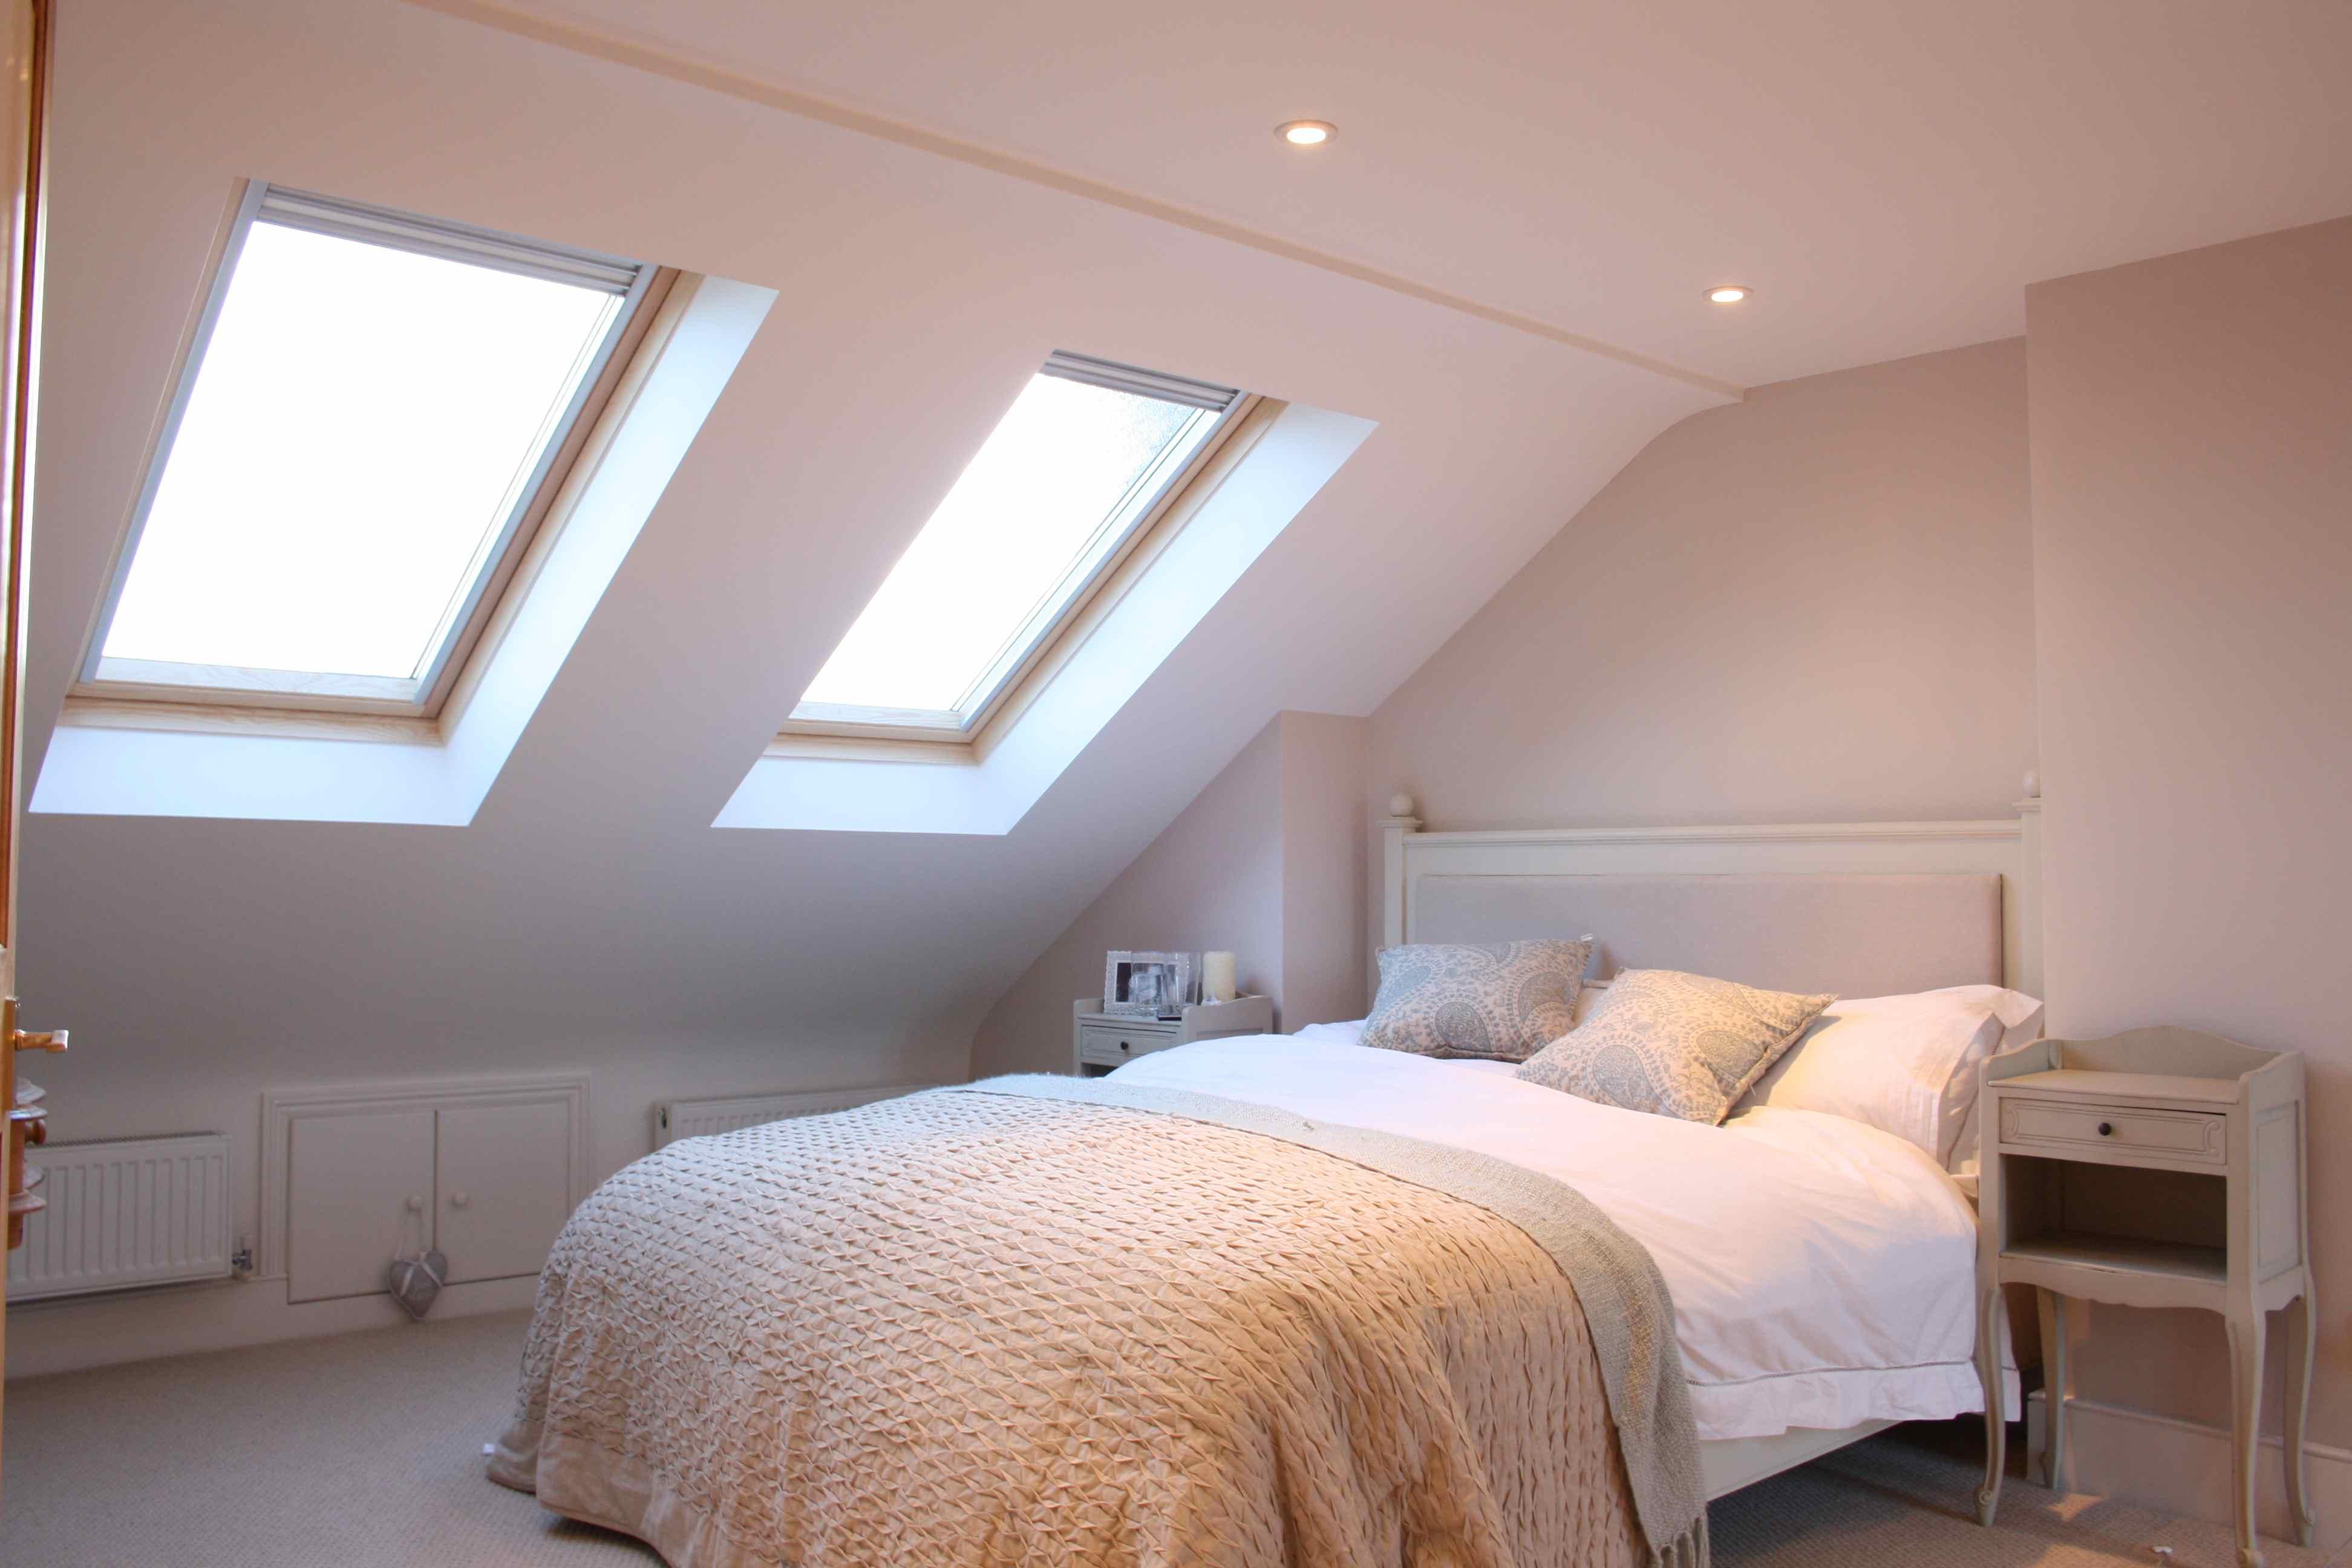 Loft conversion interior design archives simply loft - Decorating ideas for loft bedrooms ...